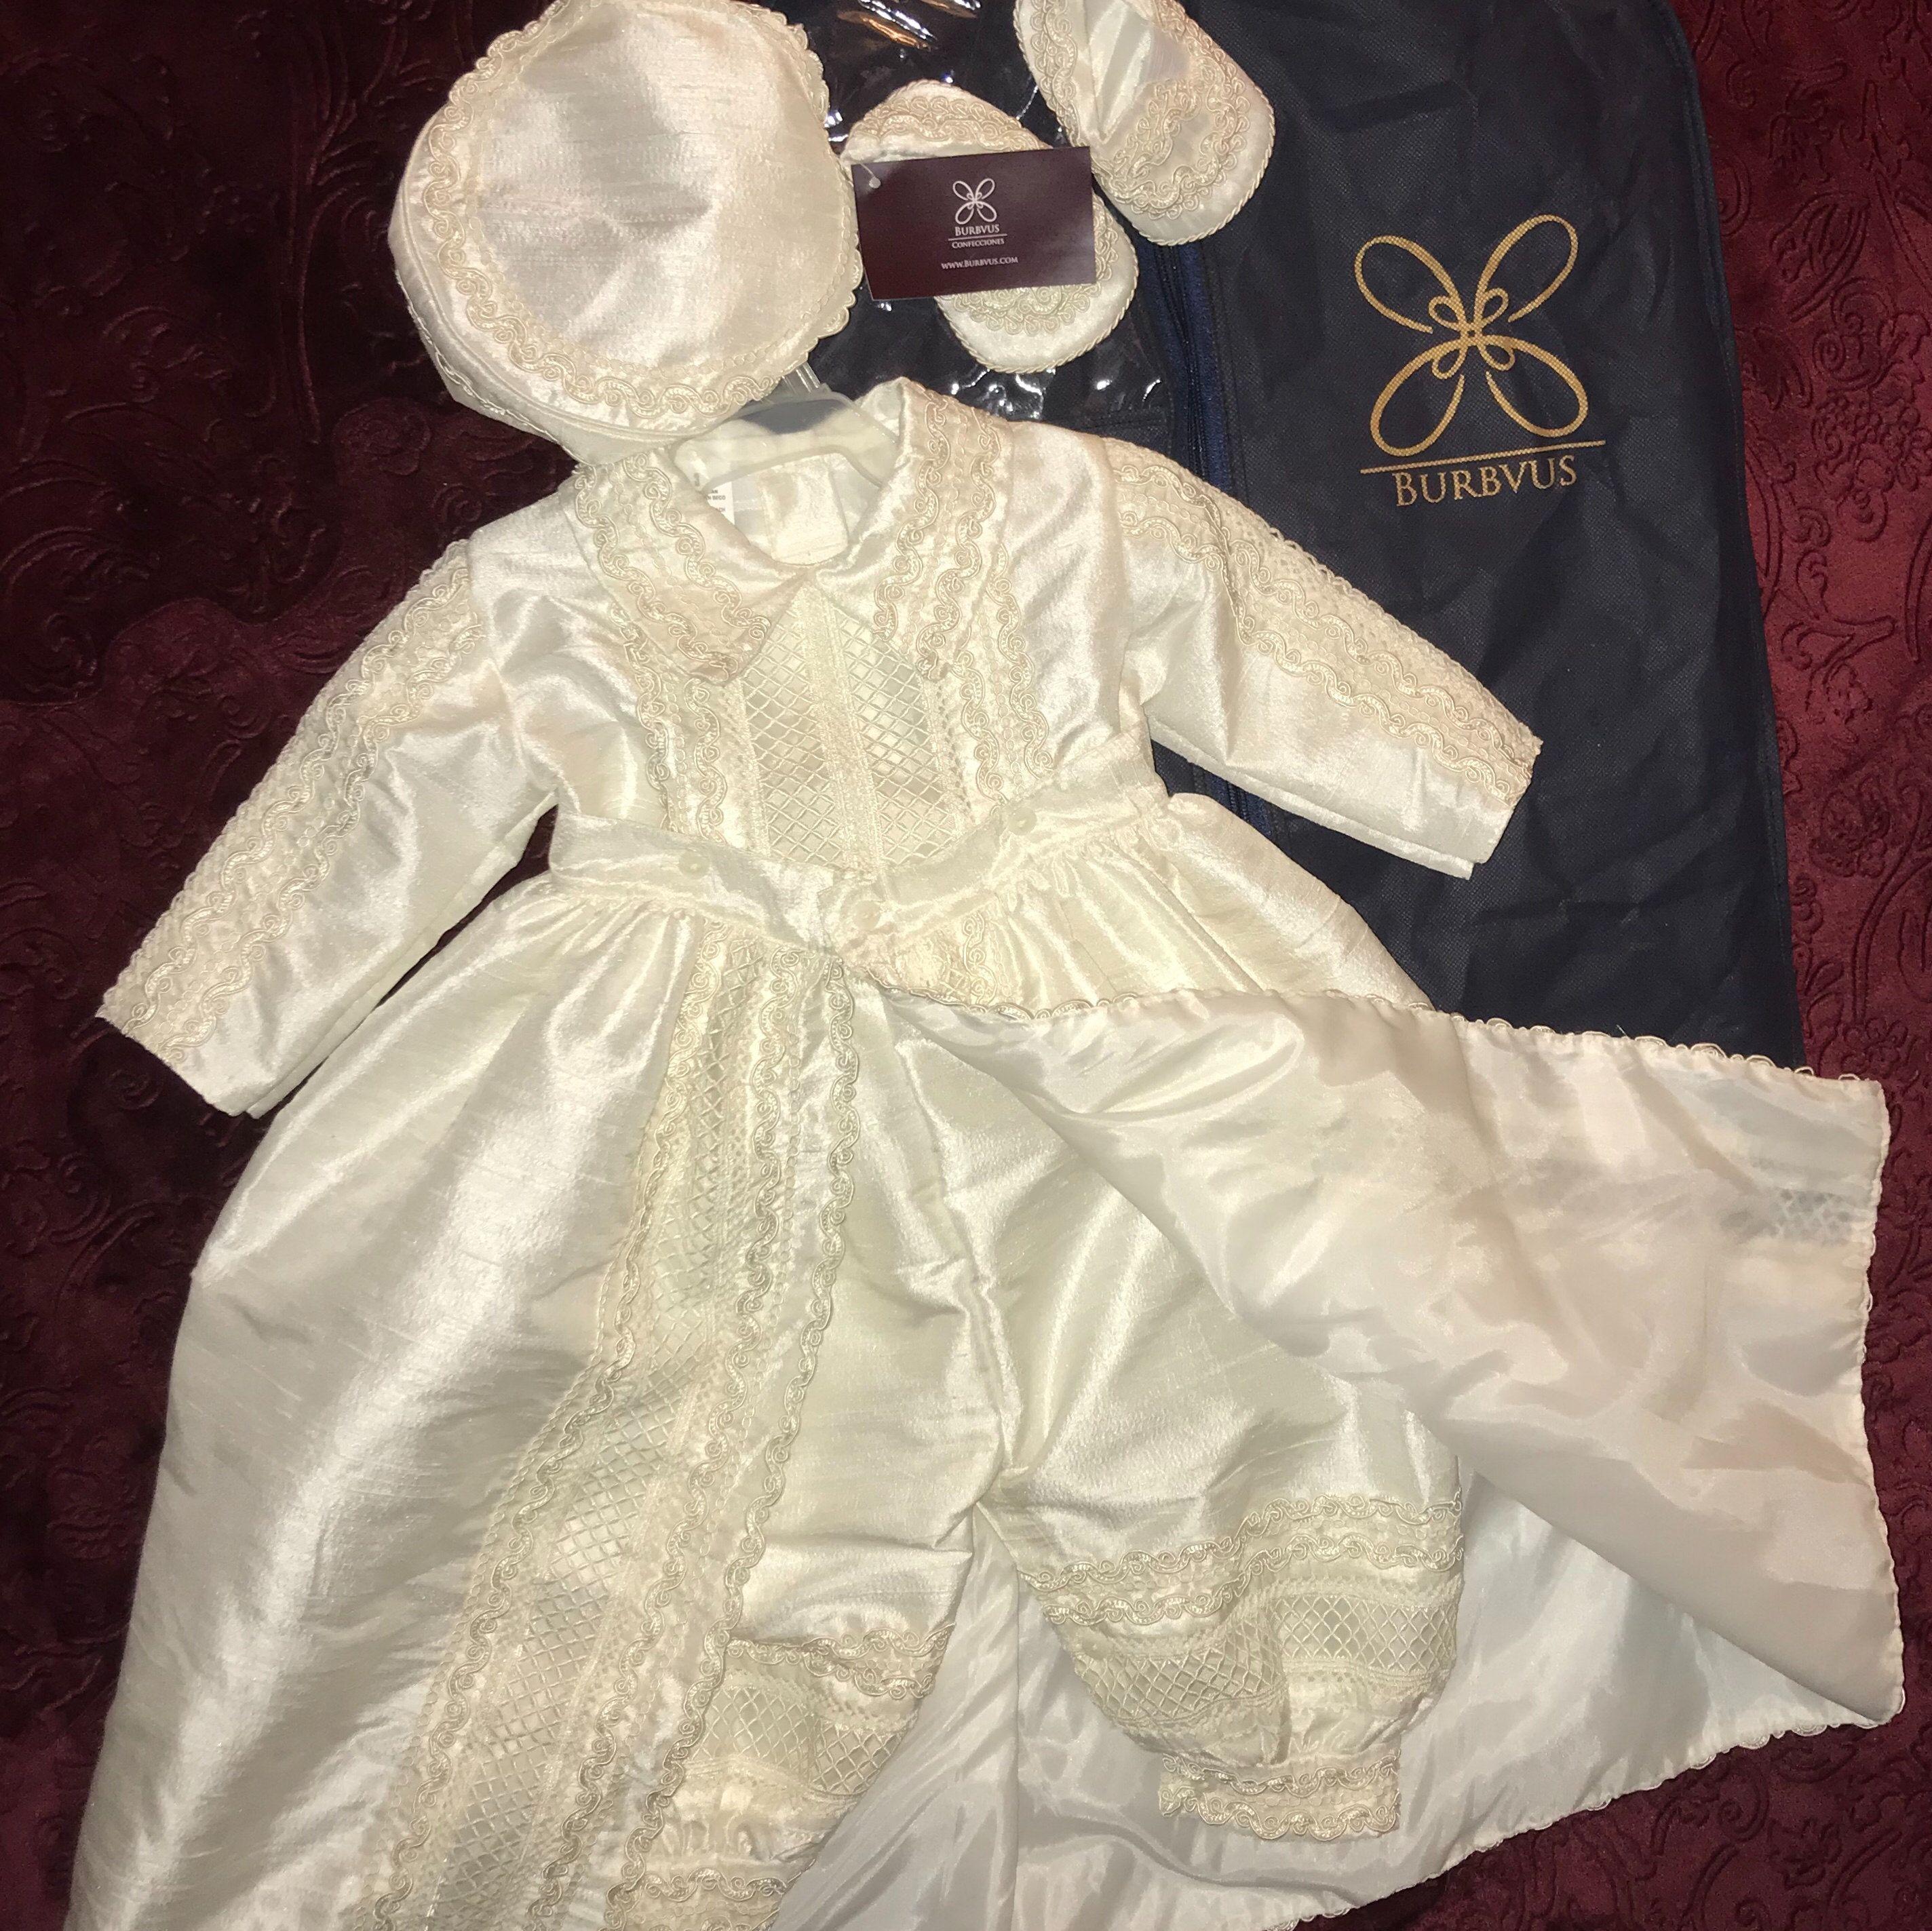 Baby Boy Baptism Outfit Burbvus B005